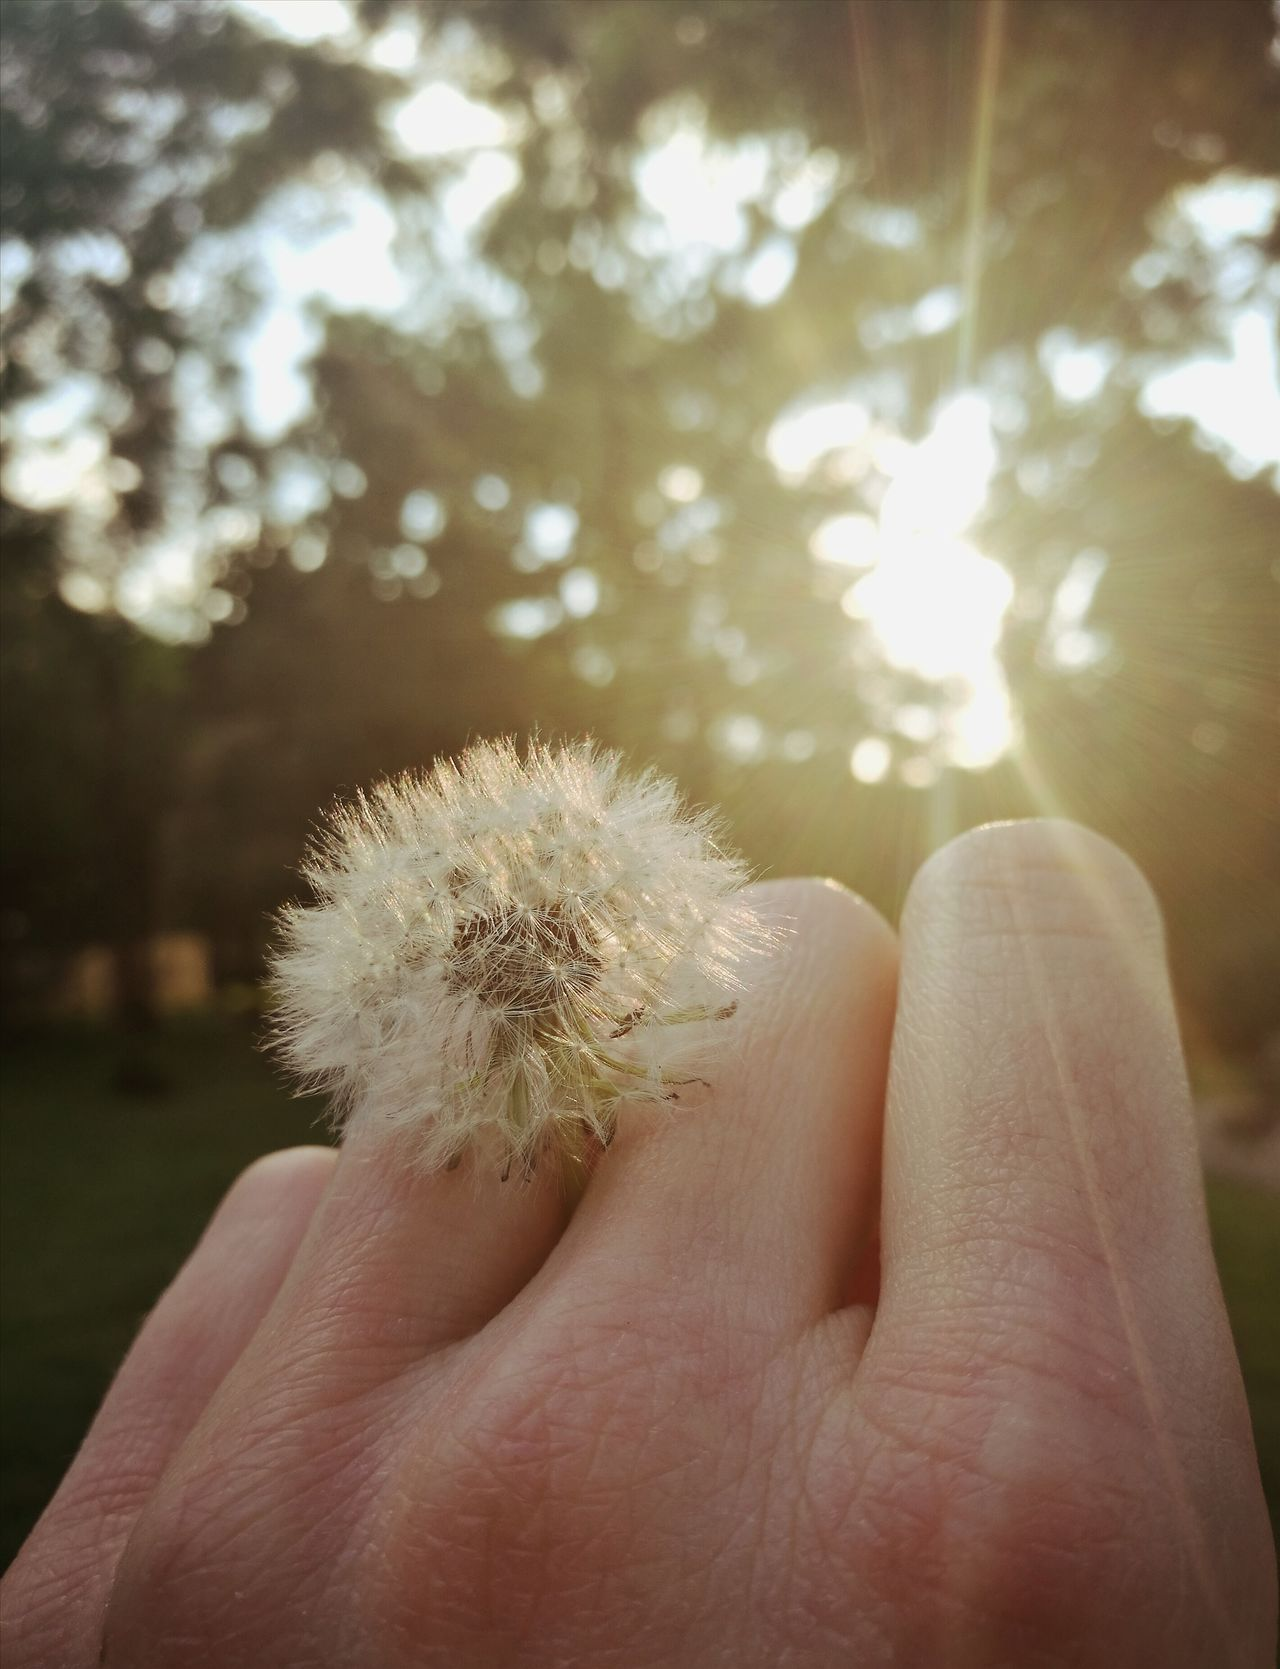 Sunset Dandelion Human Hand Ring Beauty Of Nature Warm Close-up Flower Summer